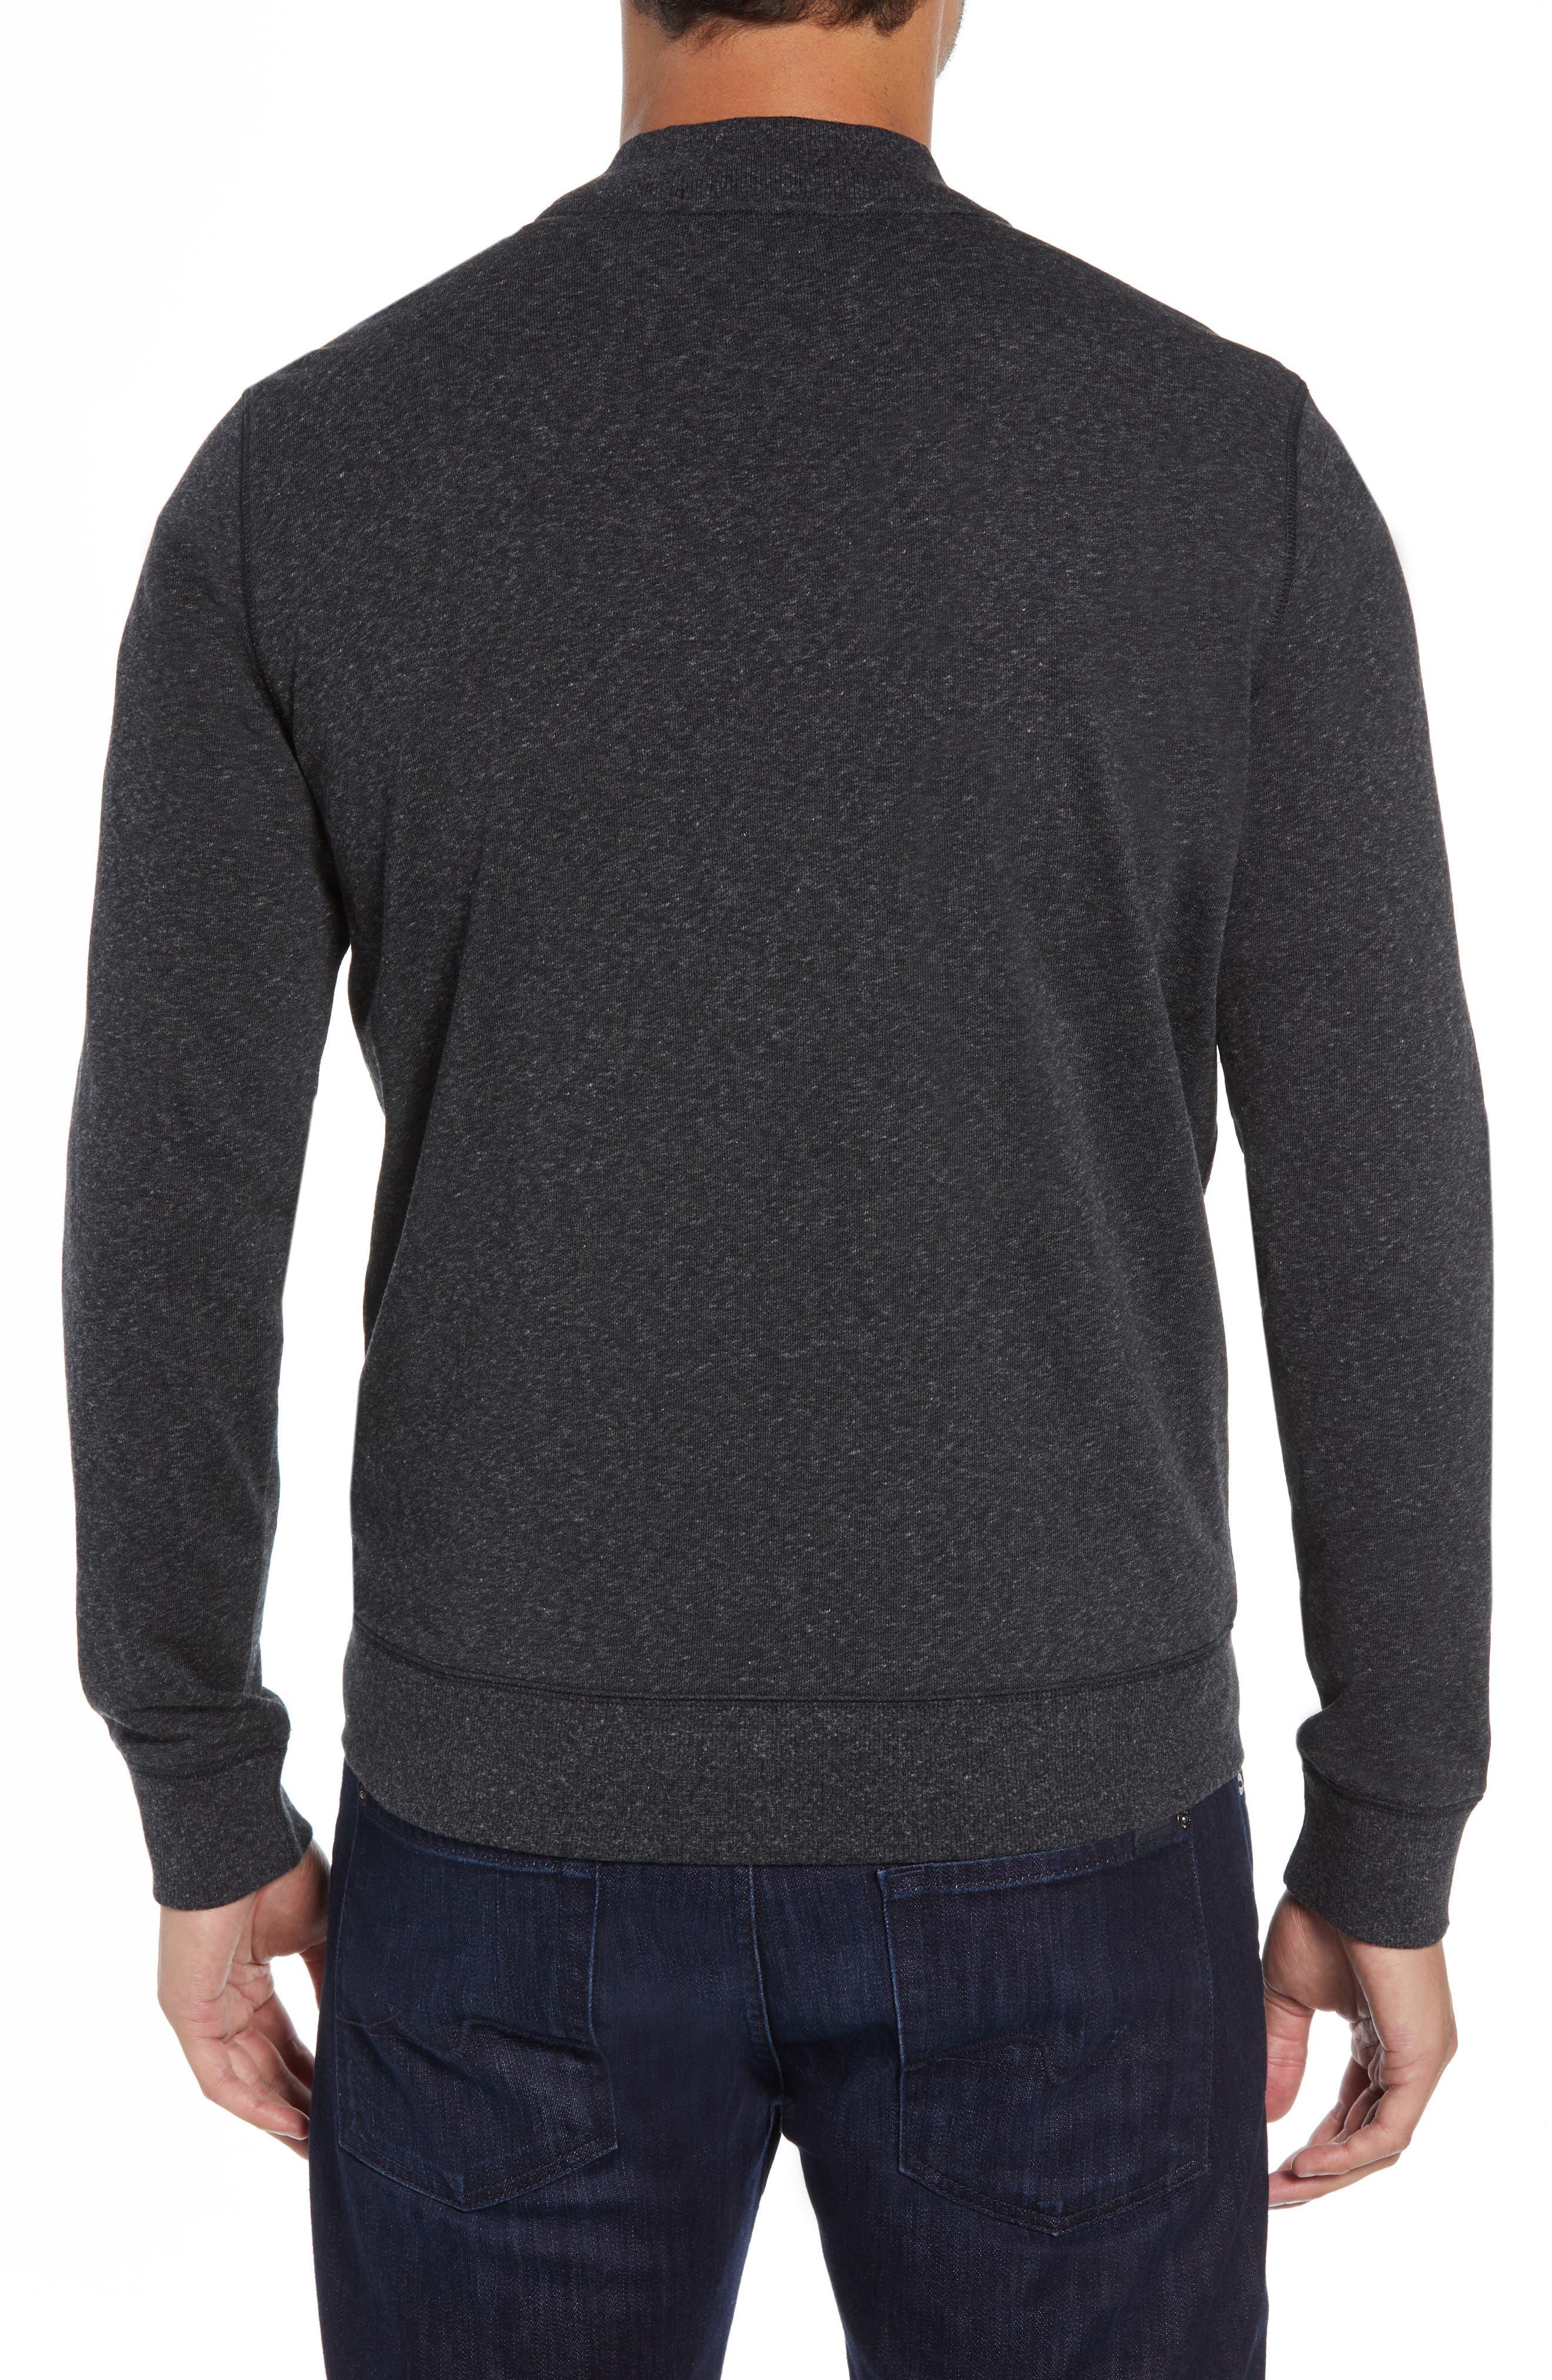 ROBERT BARAKETT, Front Zip Knit Jacket, Alternate thumbnail 2, color, BLACK